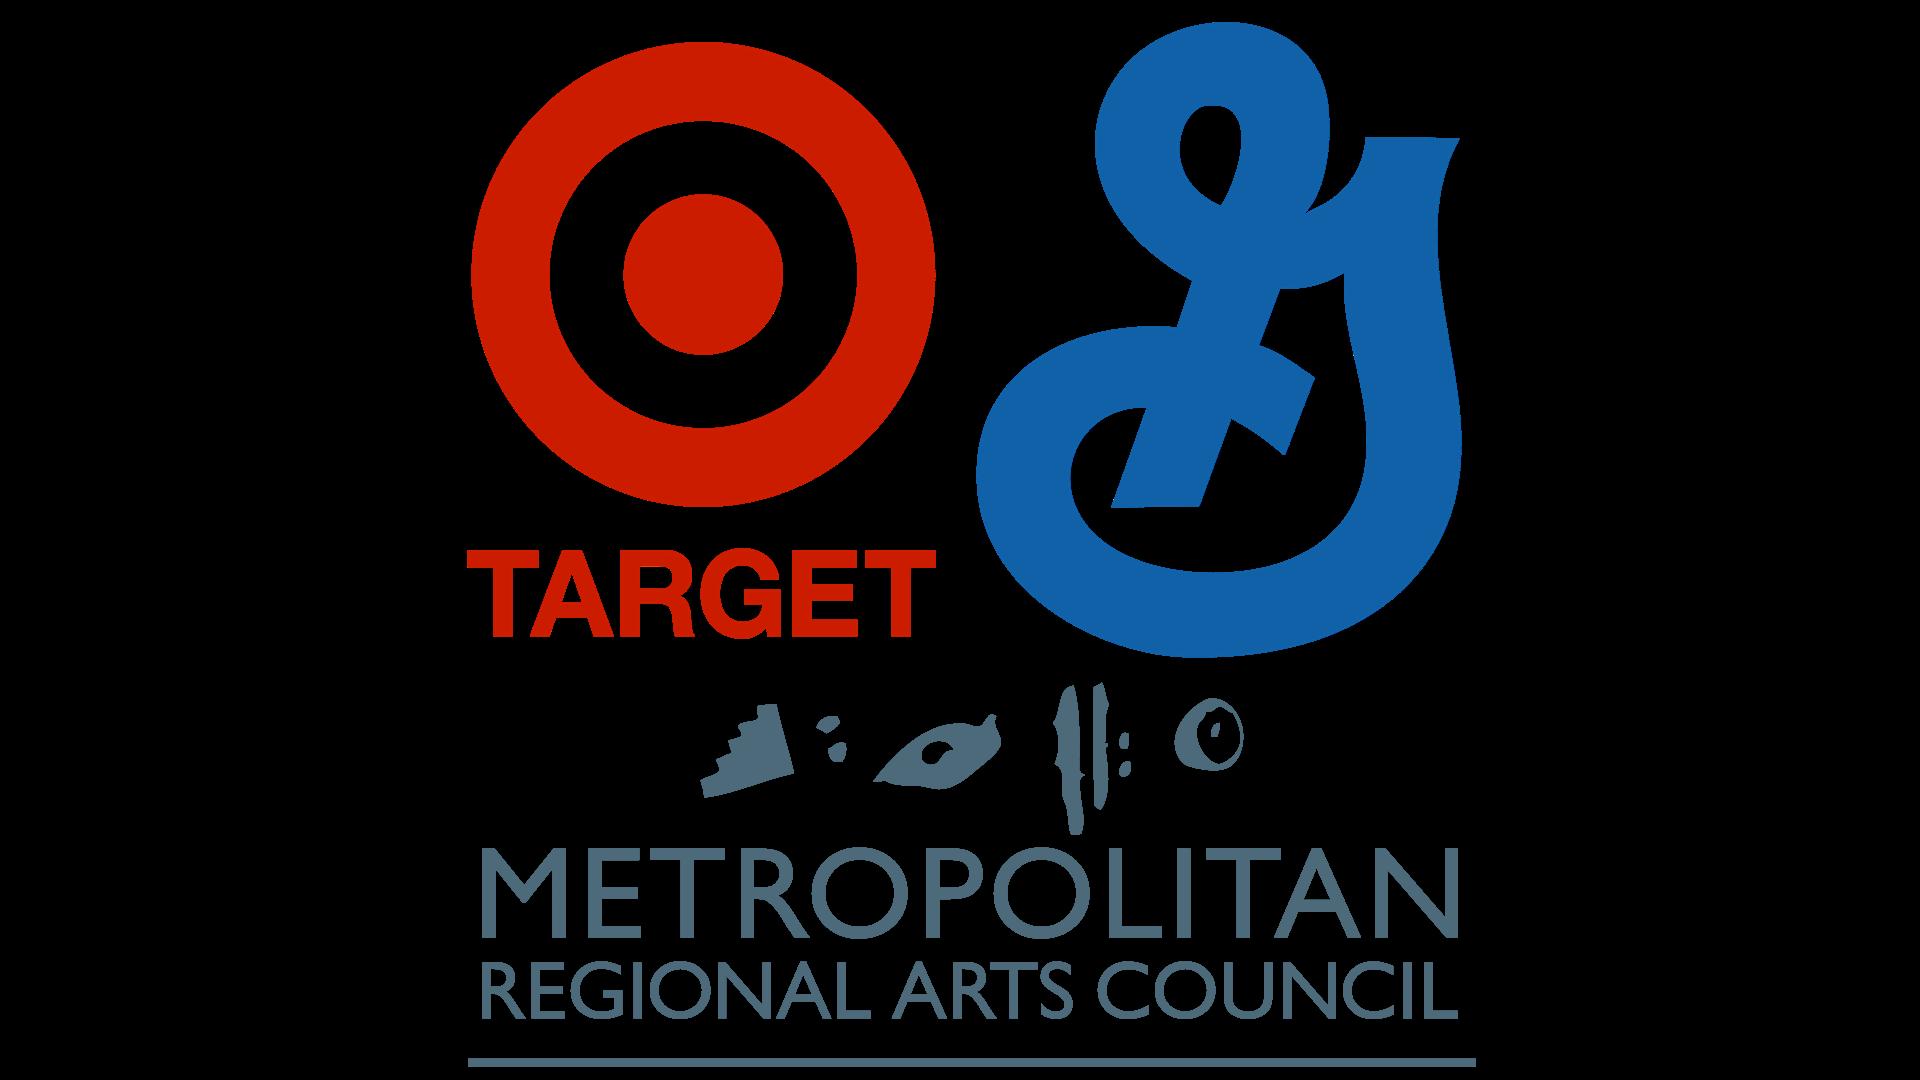 Logos of Target, General Mills, and Metropolitan Regional Arts Council